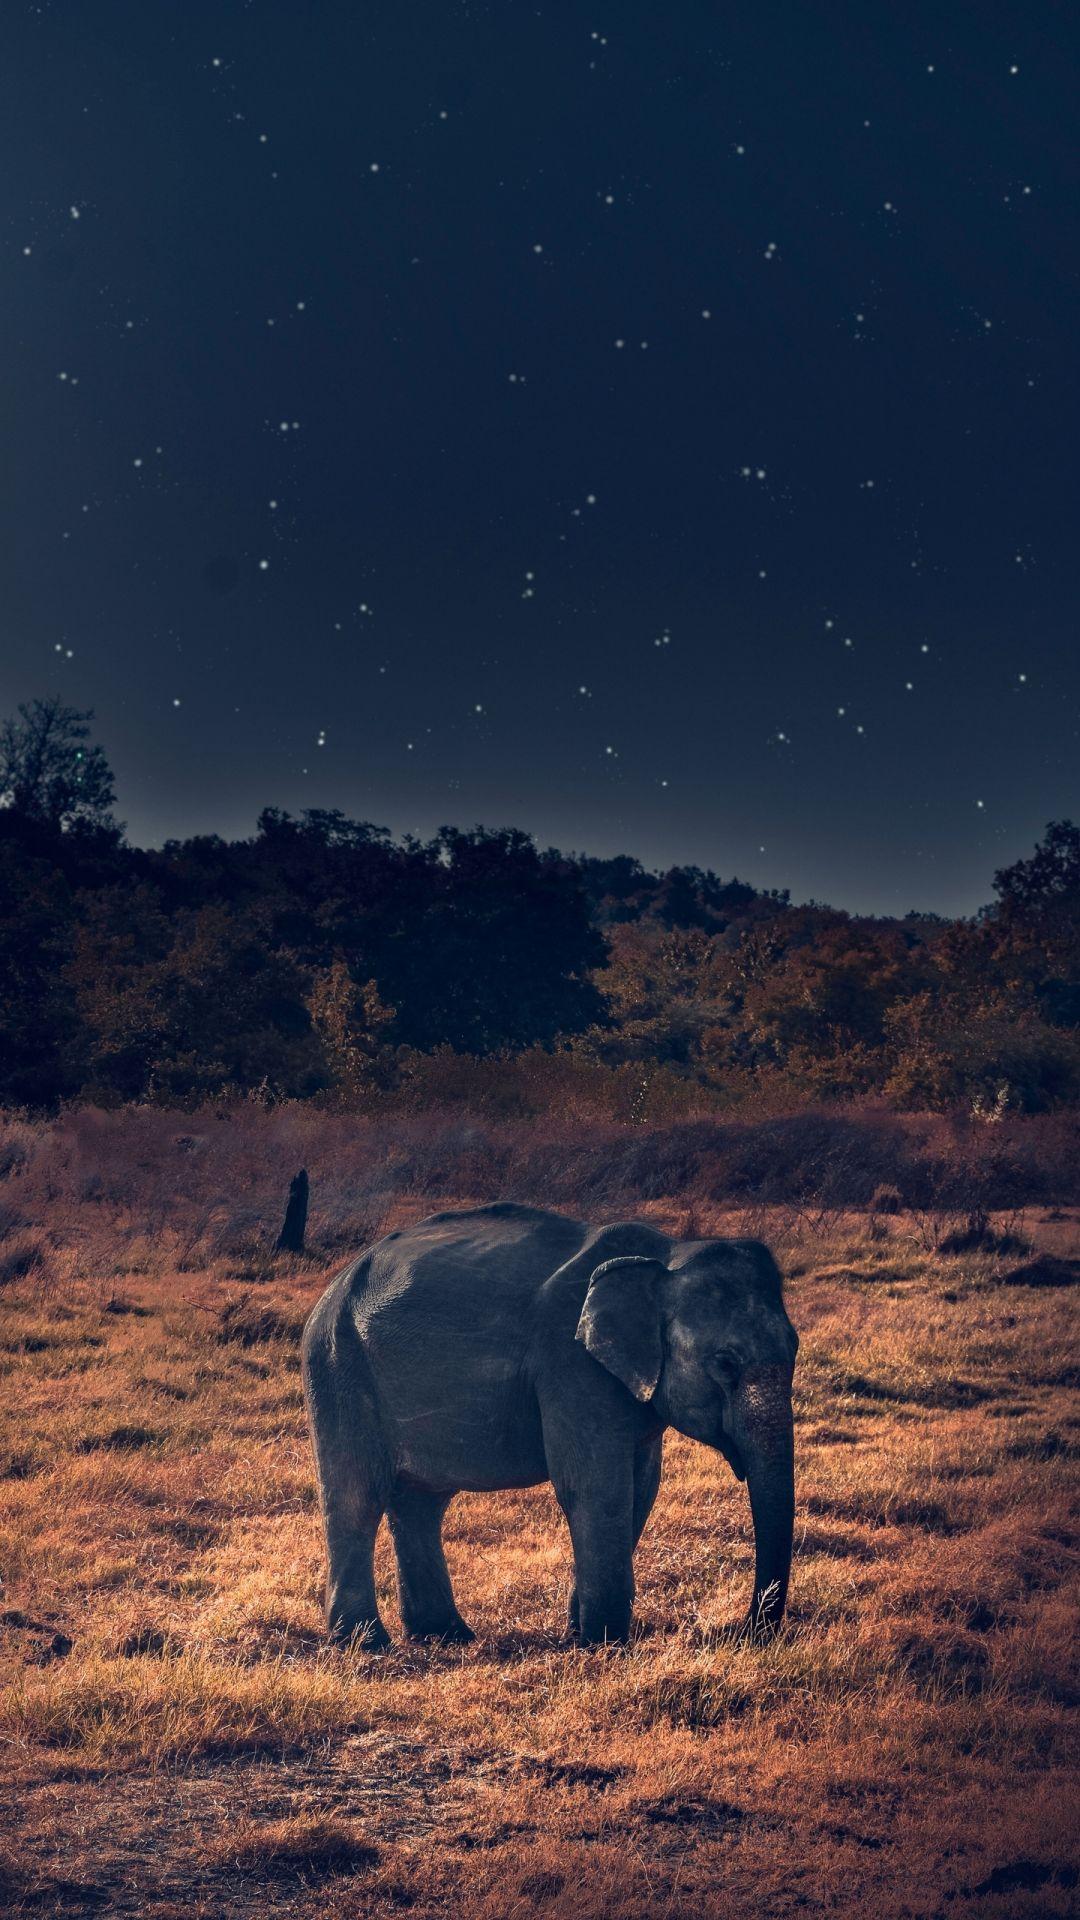 Elephant wallpaper 1080x1920